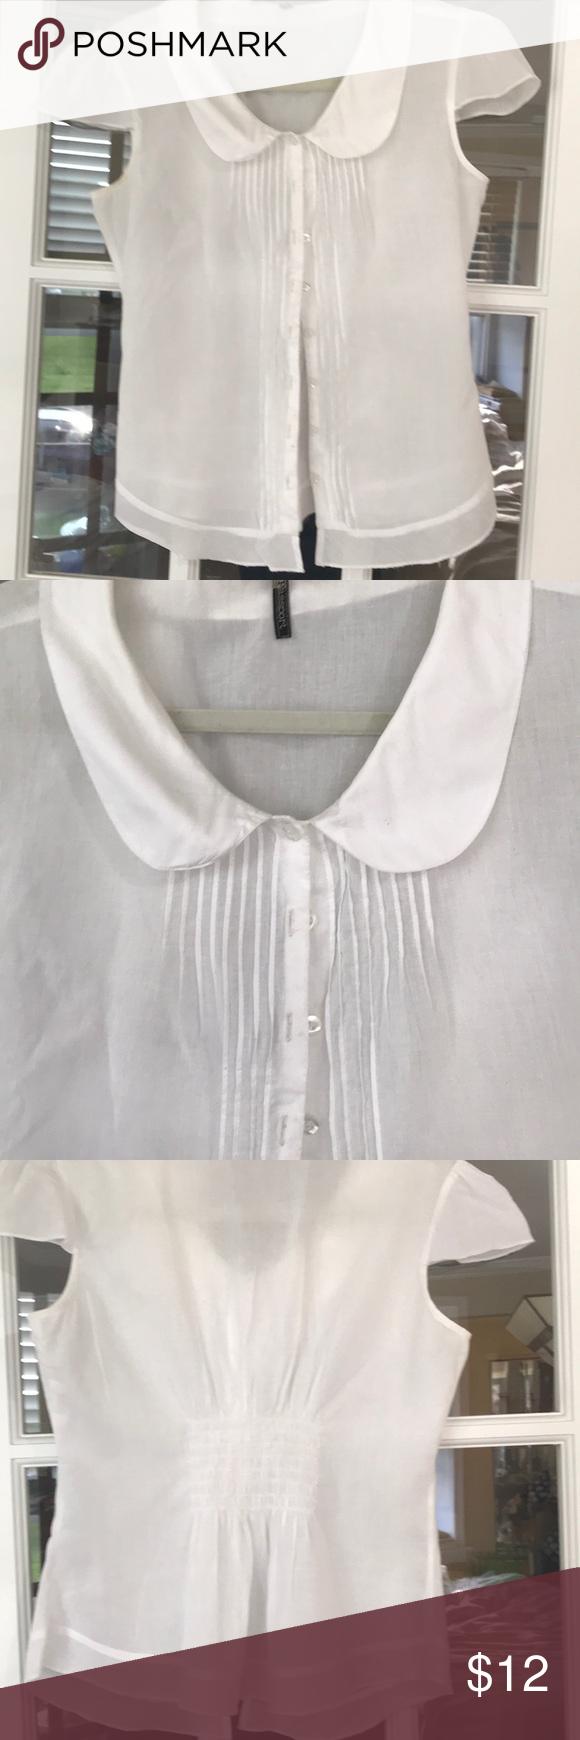 White Cotton Capped Sleeve Shirt Cap Sleeve Shirt Shirt Sleeves Cap Sleeves